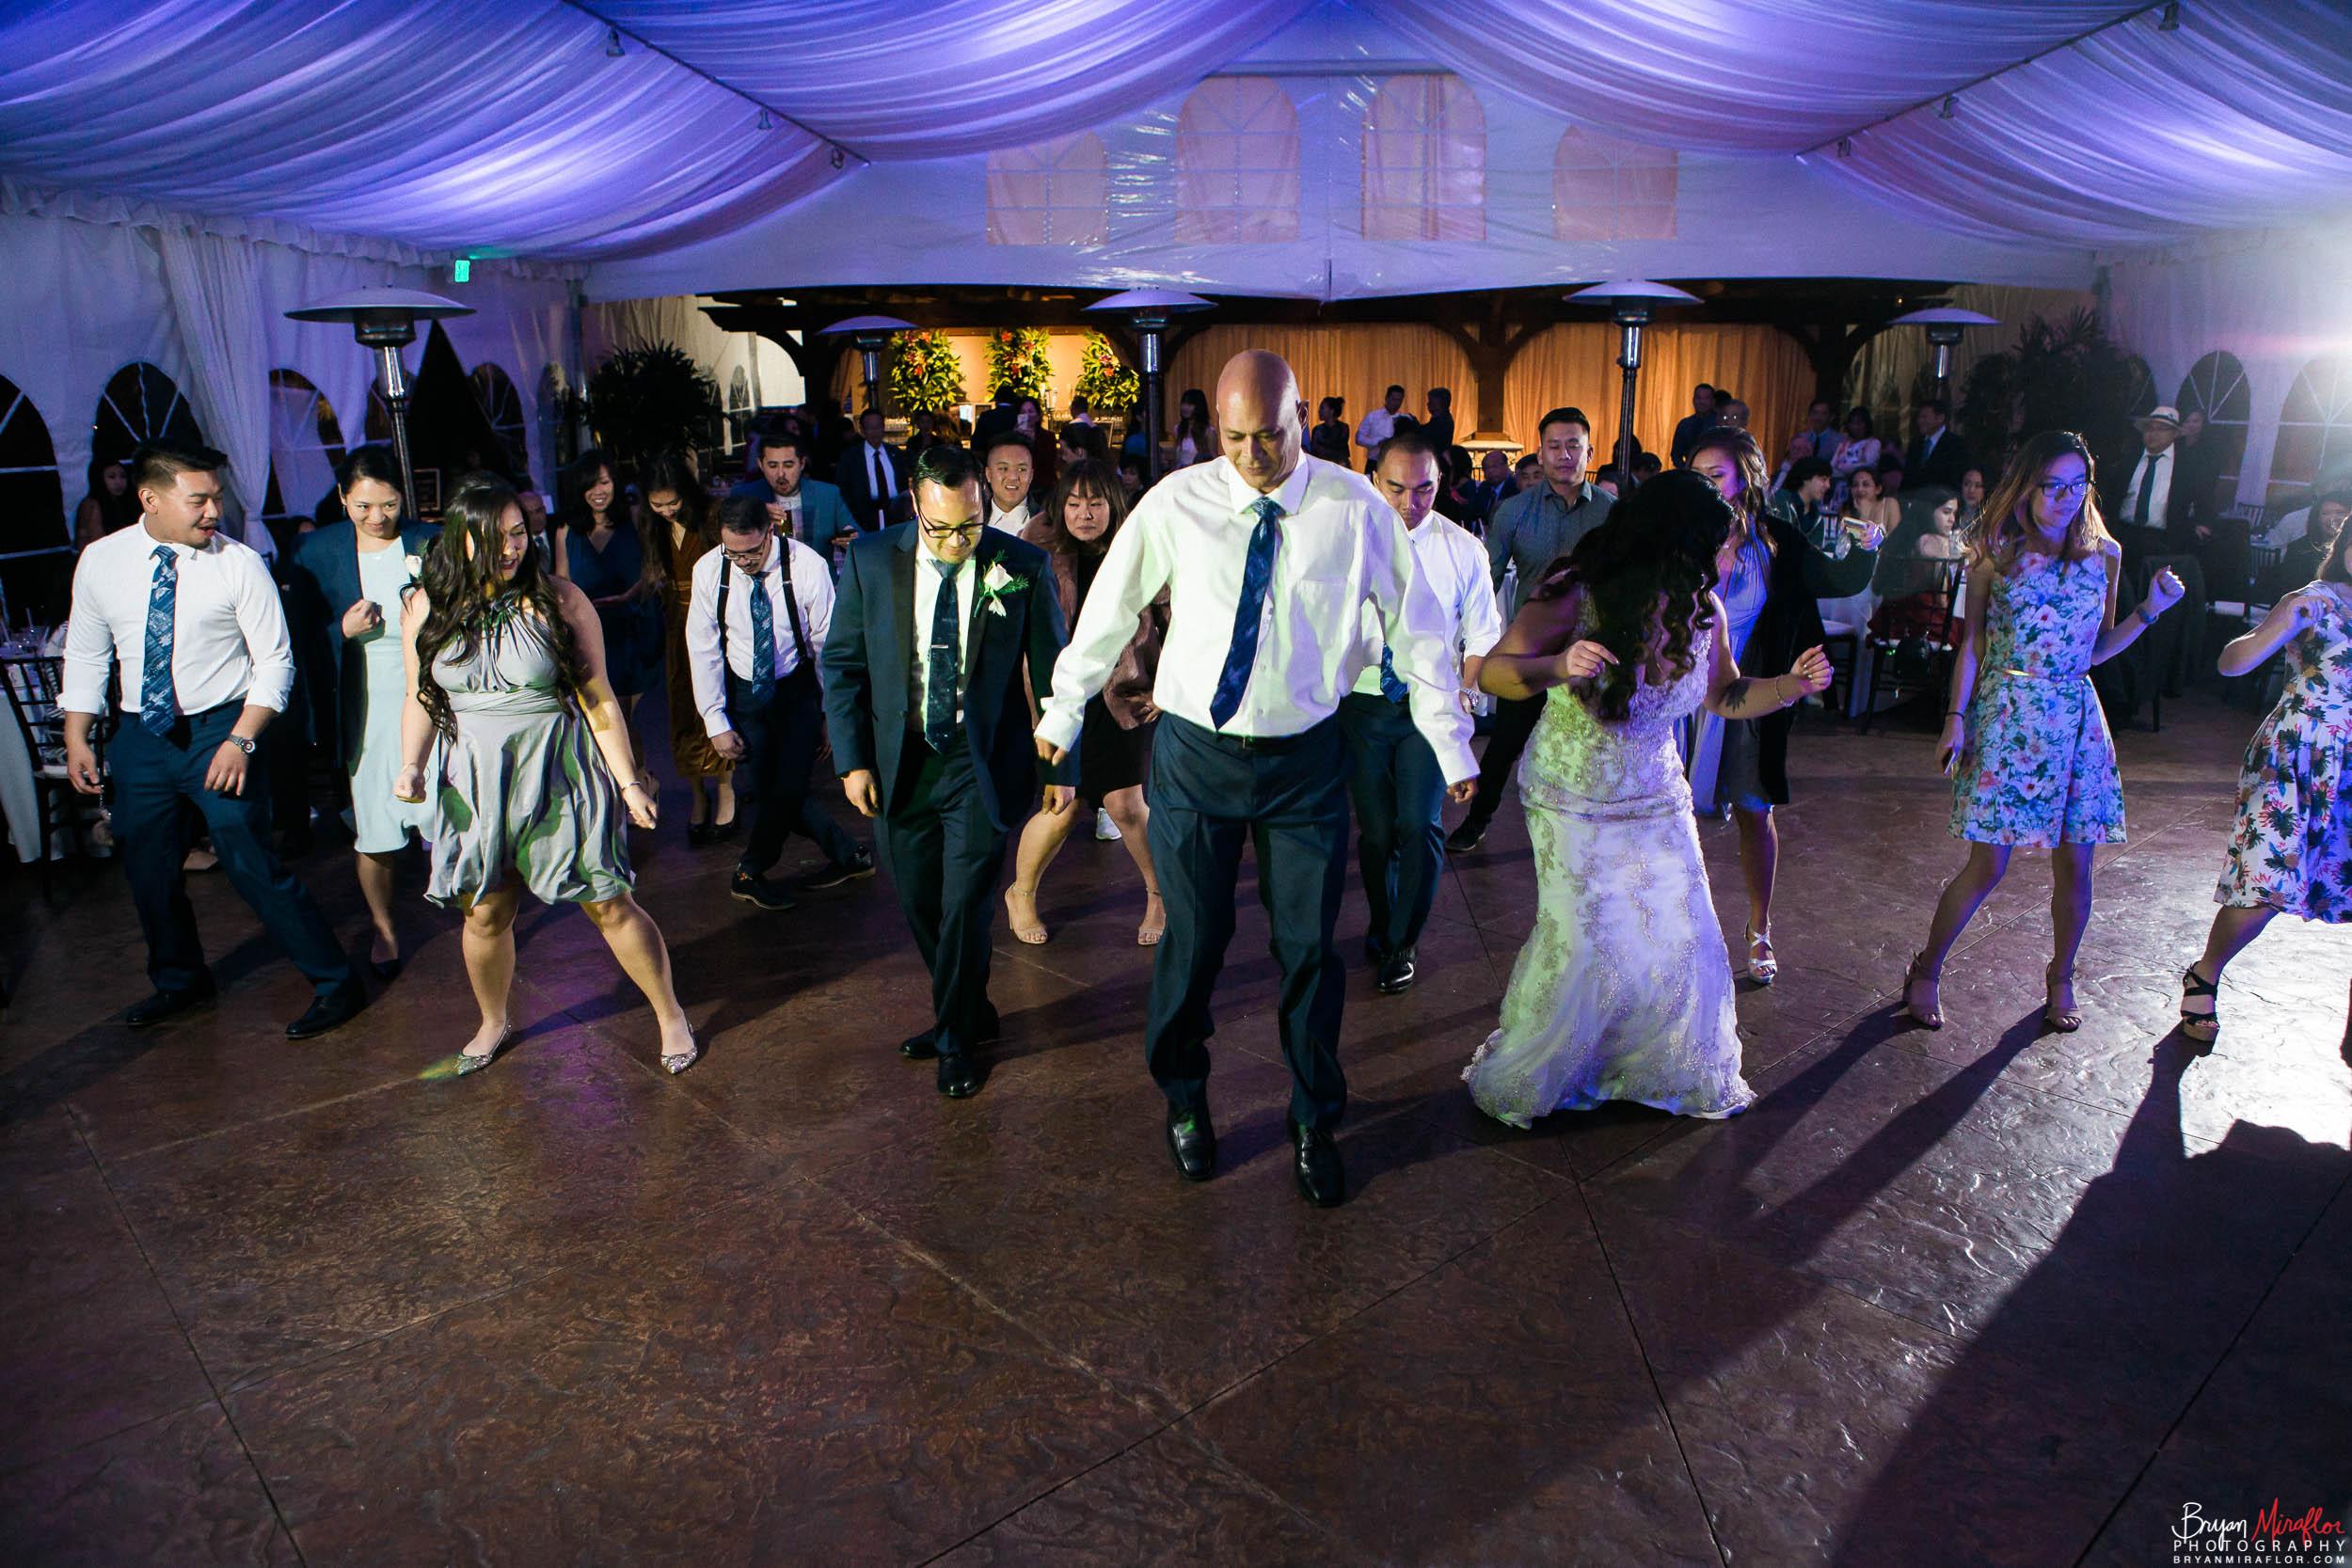 Bryan-Miraflor-Photography-Hannah-Jonathan-Married-Grand-Traditions-Estate-Gardens-Fallbrook-20171222-215.jpg